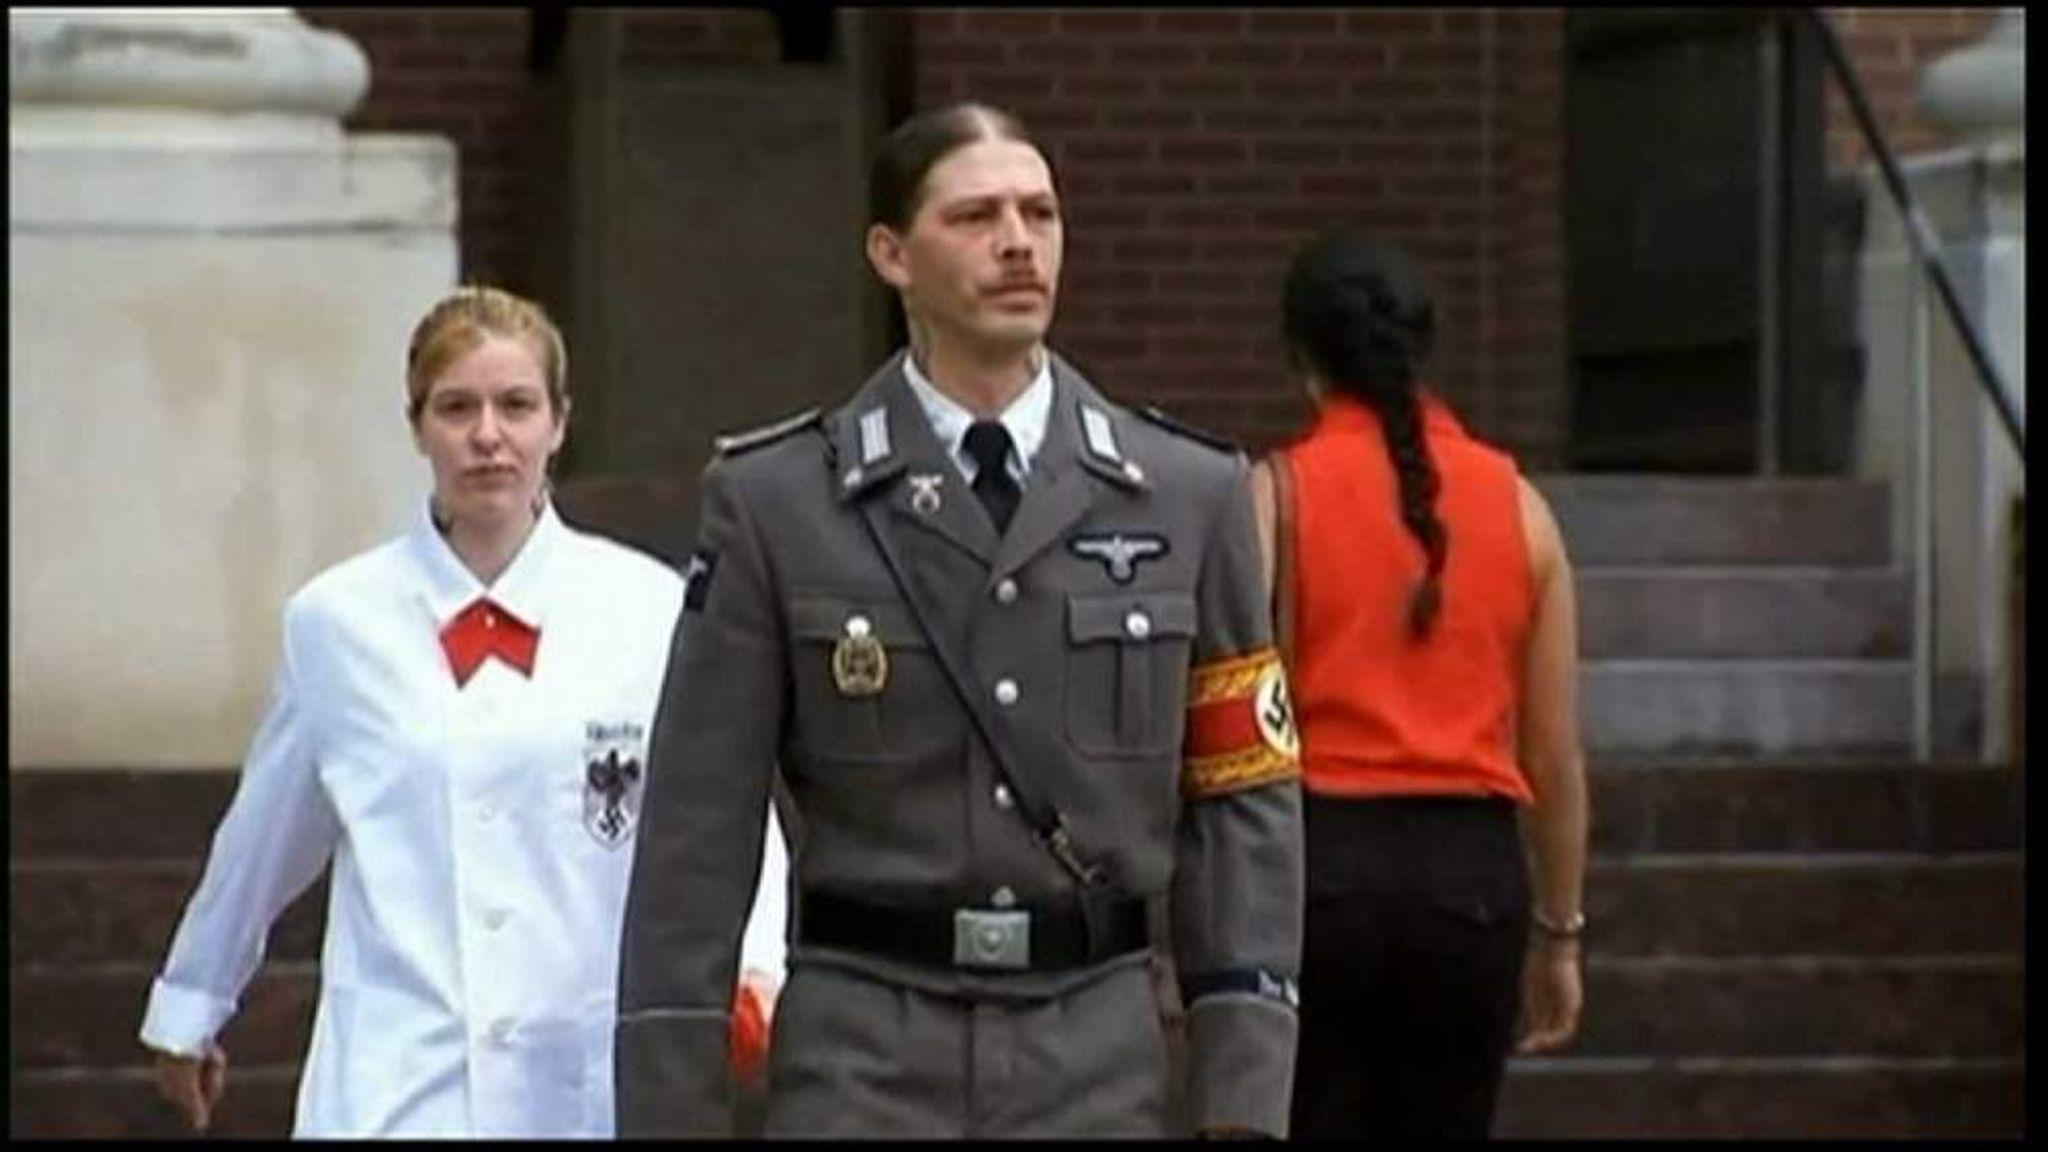 Dad Wears Nazi Uniform To Court